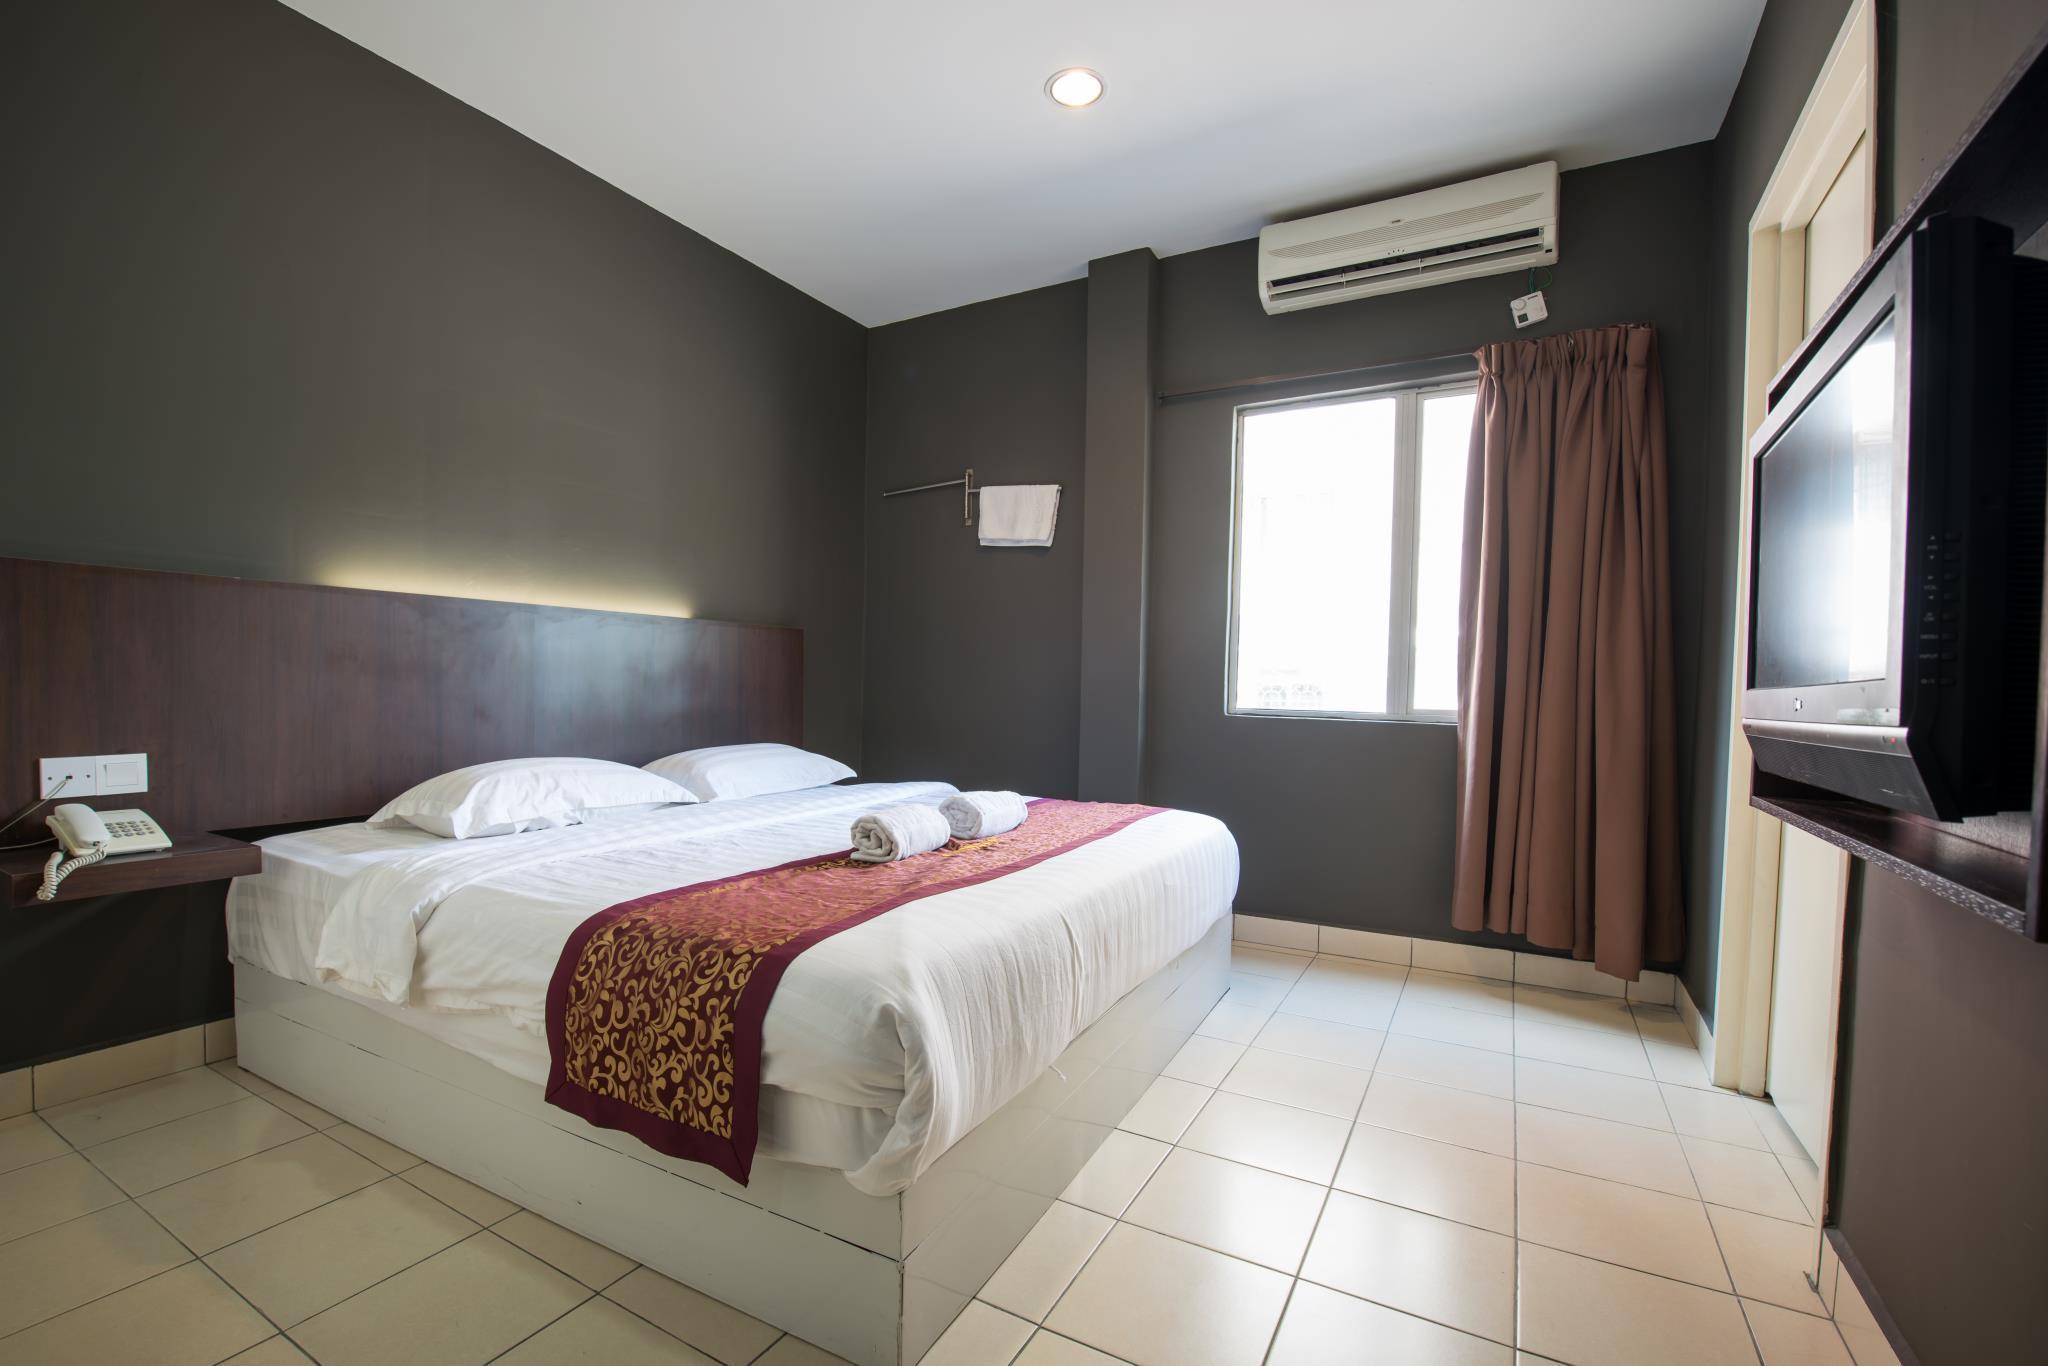 Hotel Super Cowboy, Kota Melaka